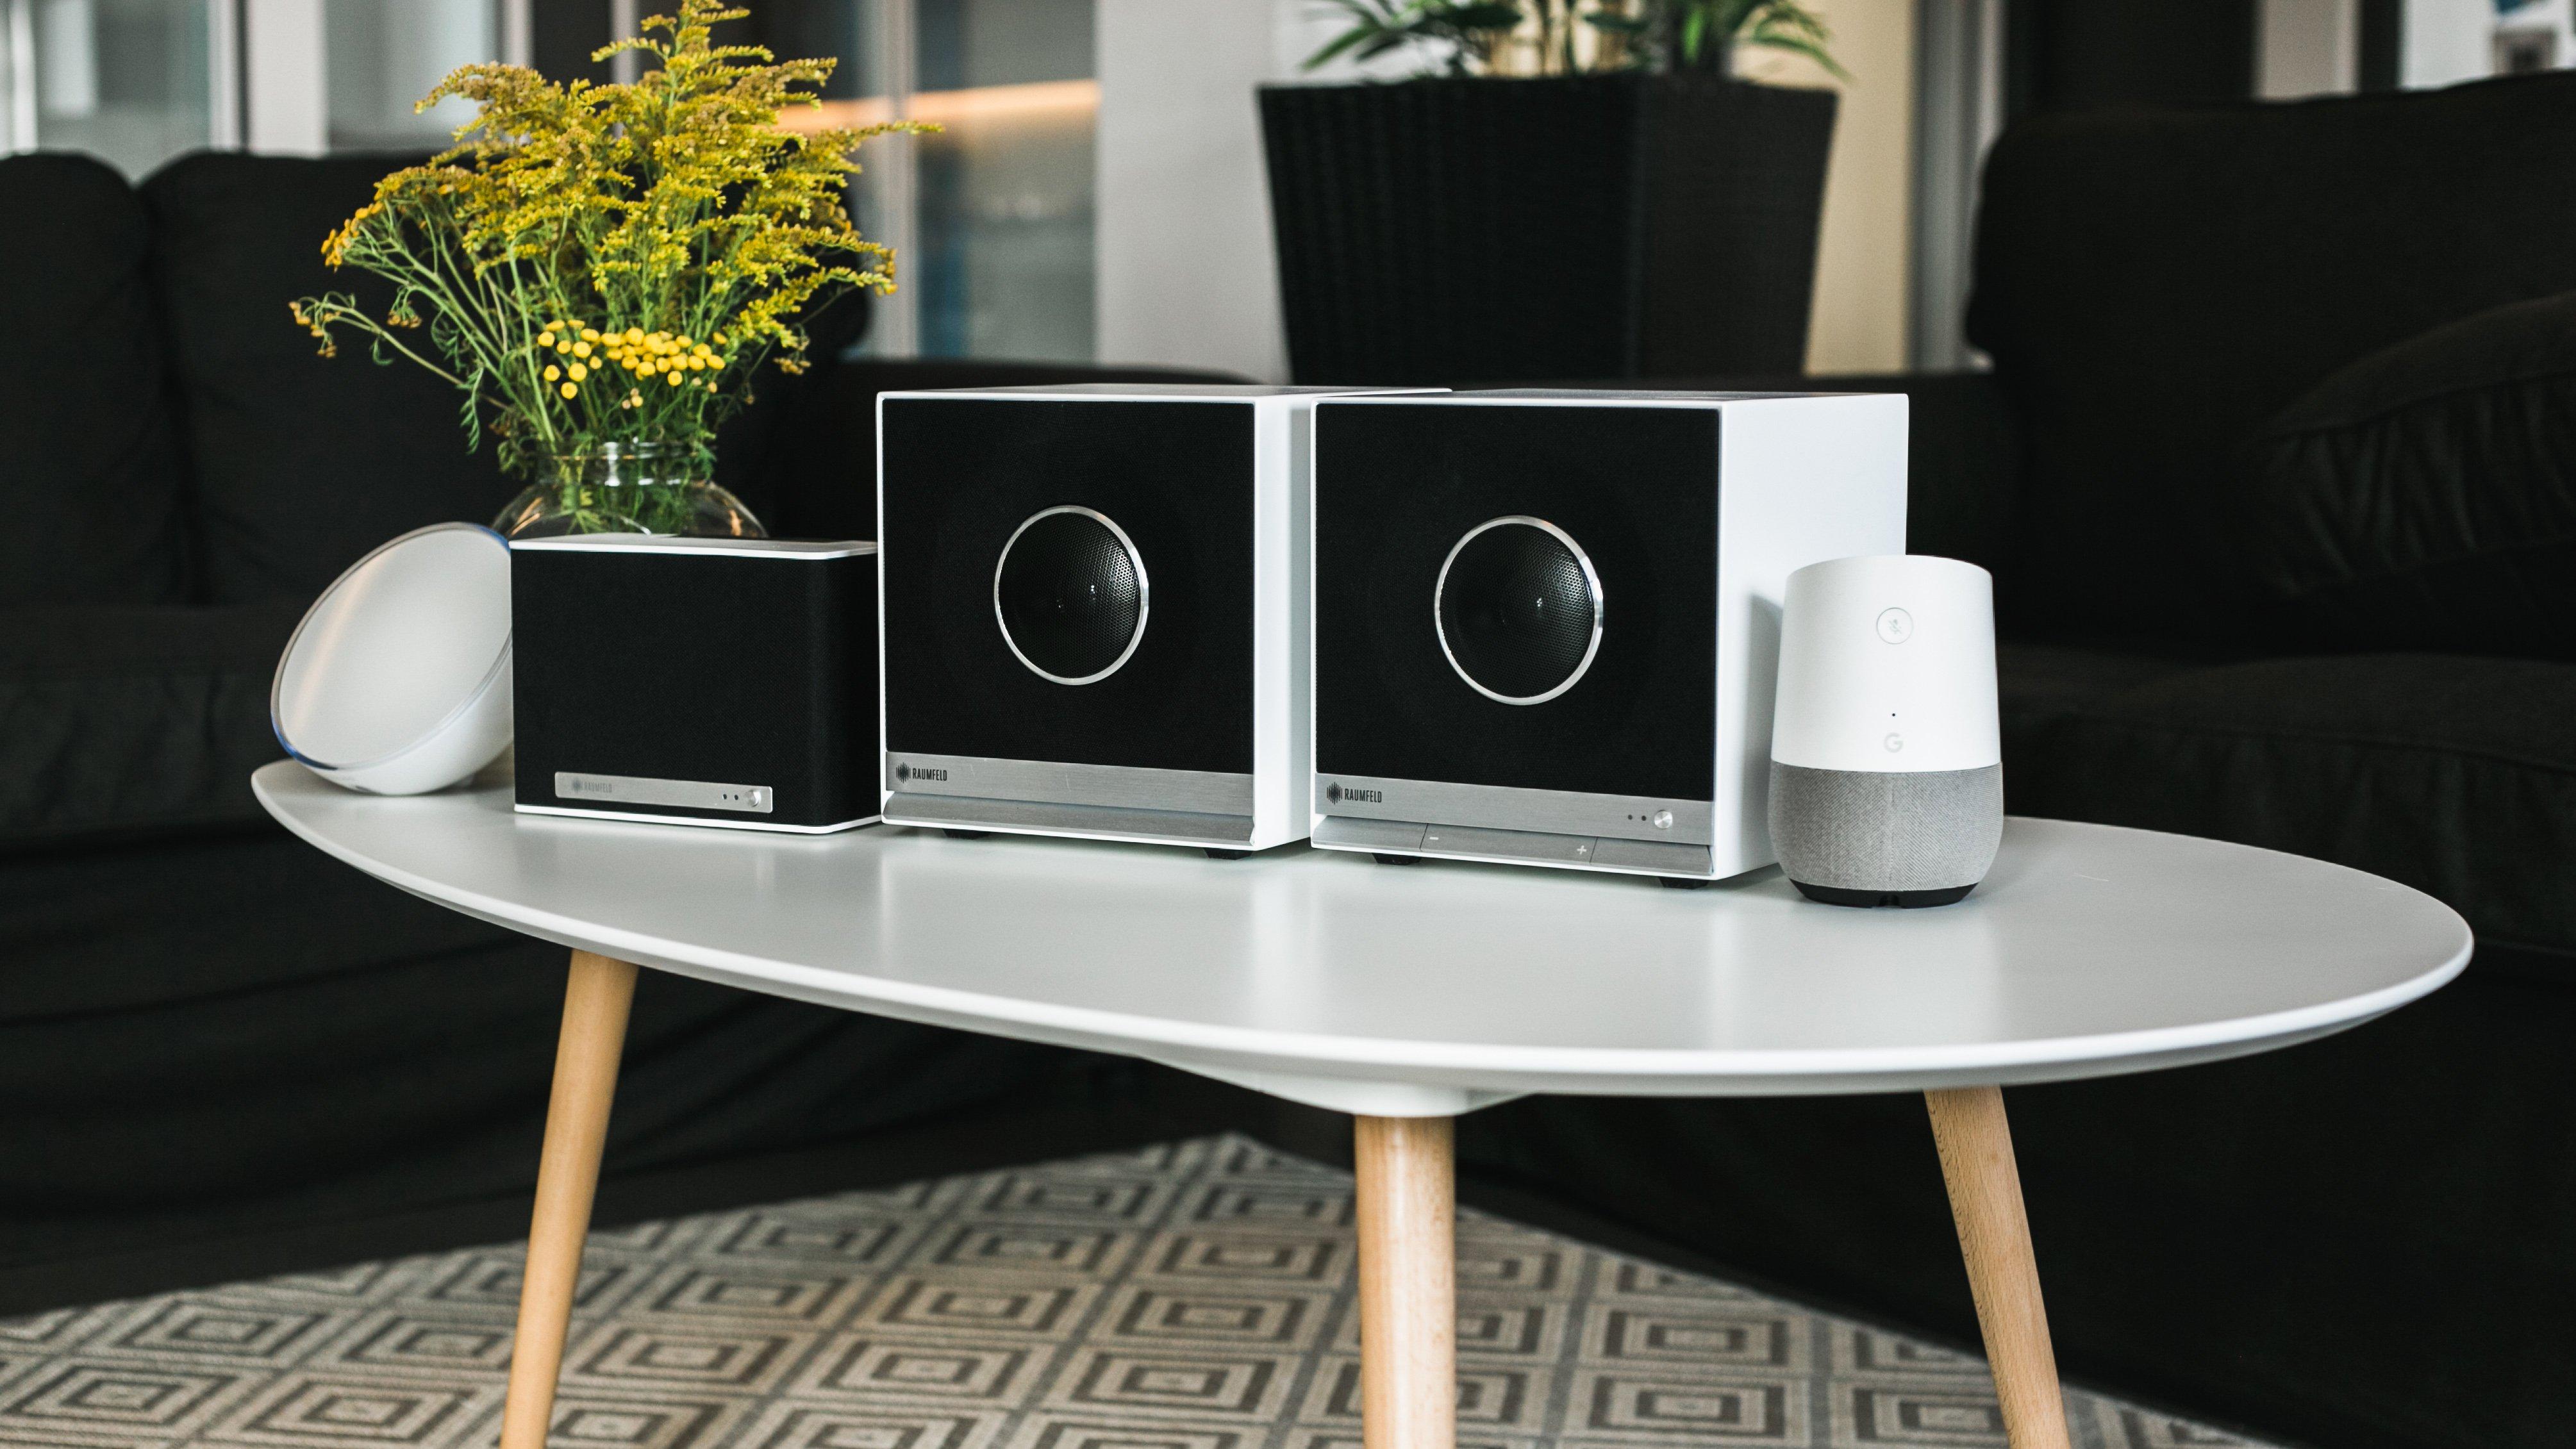 wlan lautsprecher smarte speaker im vergleich androidpit. Black Bedroom Furniture Sets. Home Design Ideas